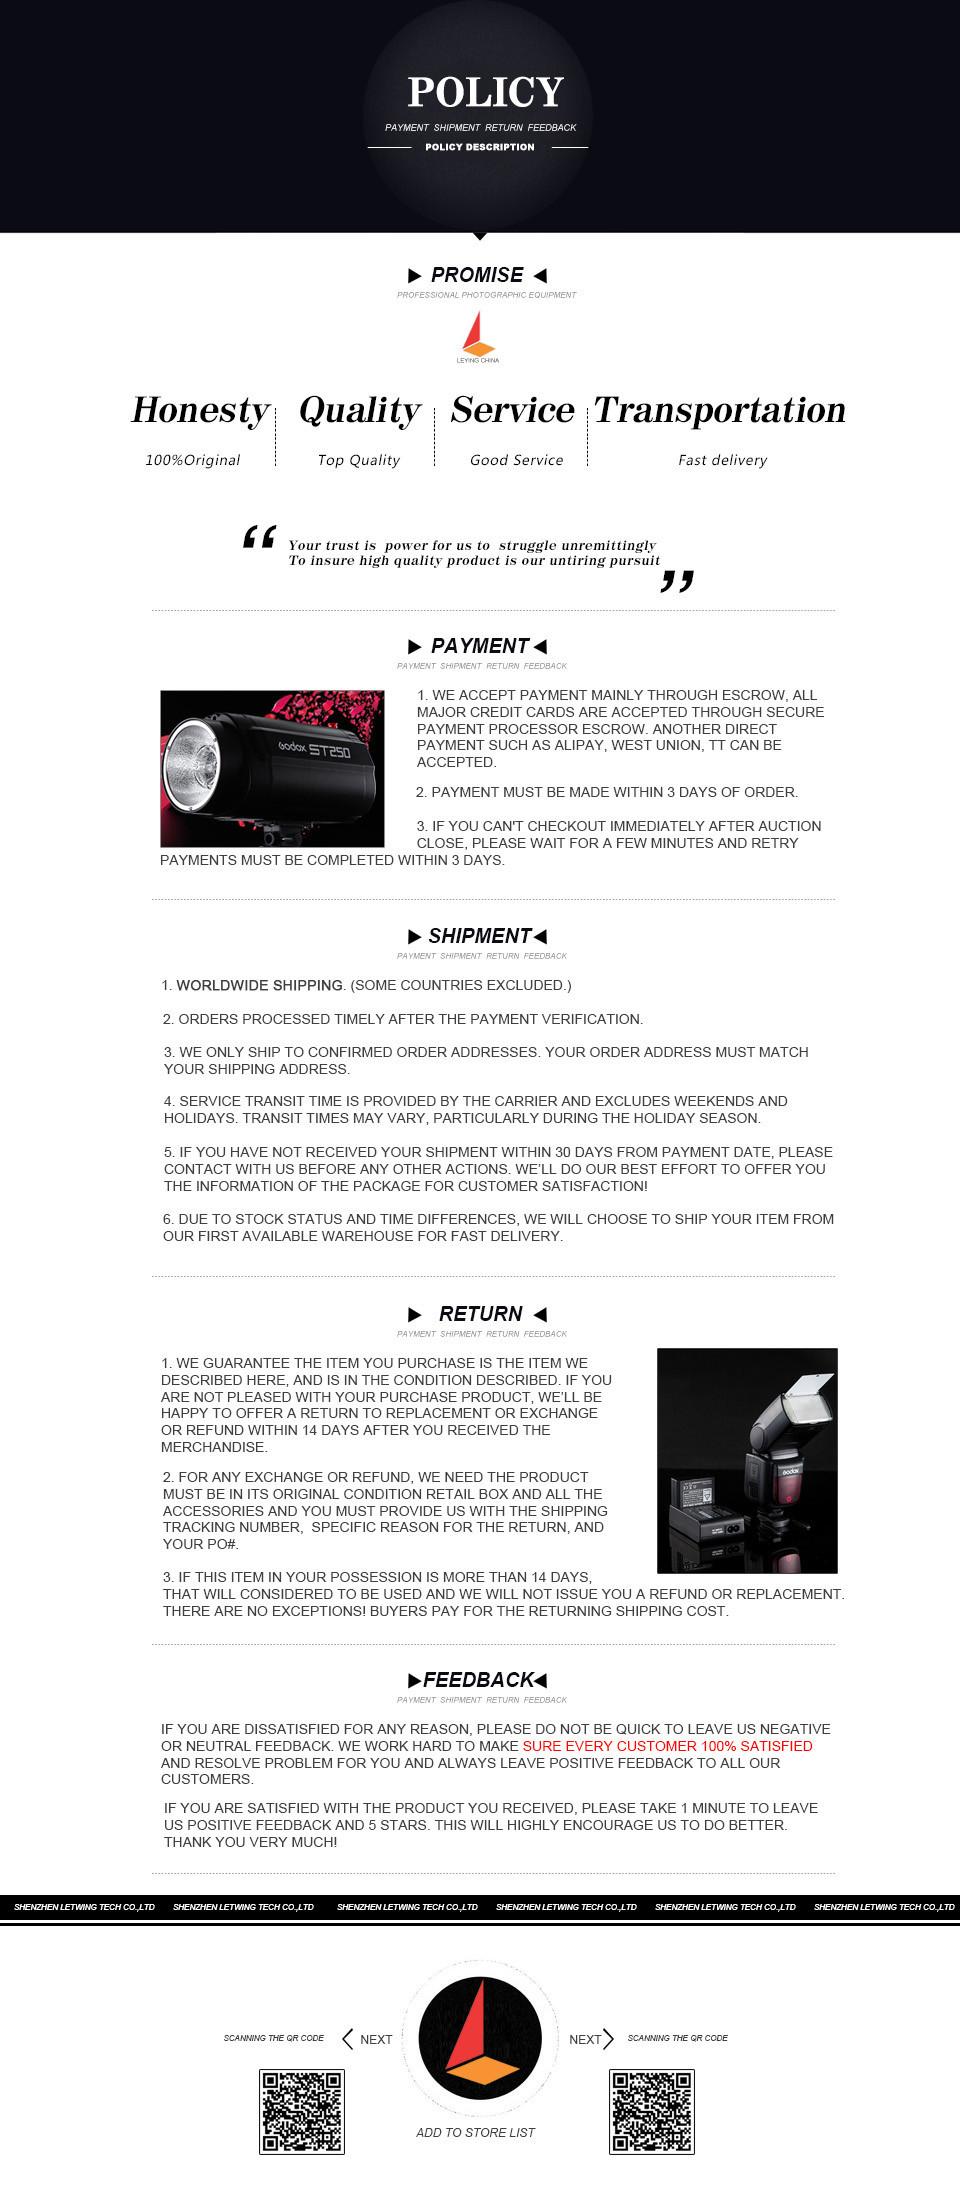 FeiYu G4 3-axis Brushless Handheld Gimbal for GoPro Hero 4 3+ SJ4000 Action Sports Cameras